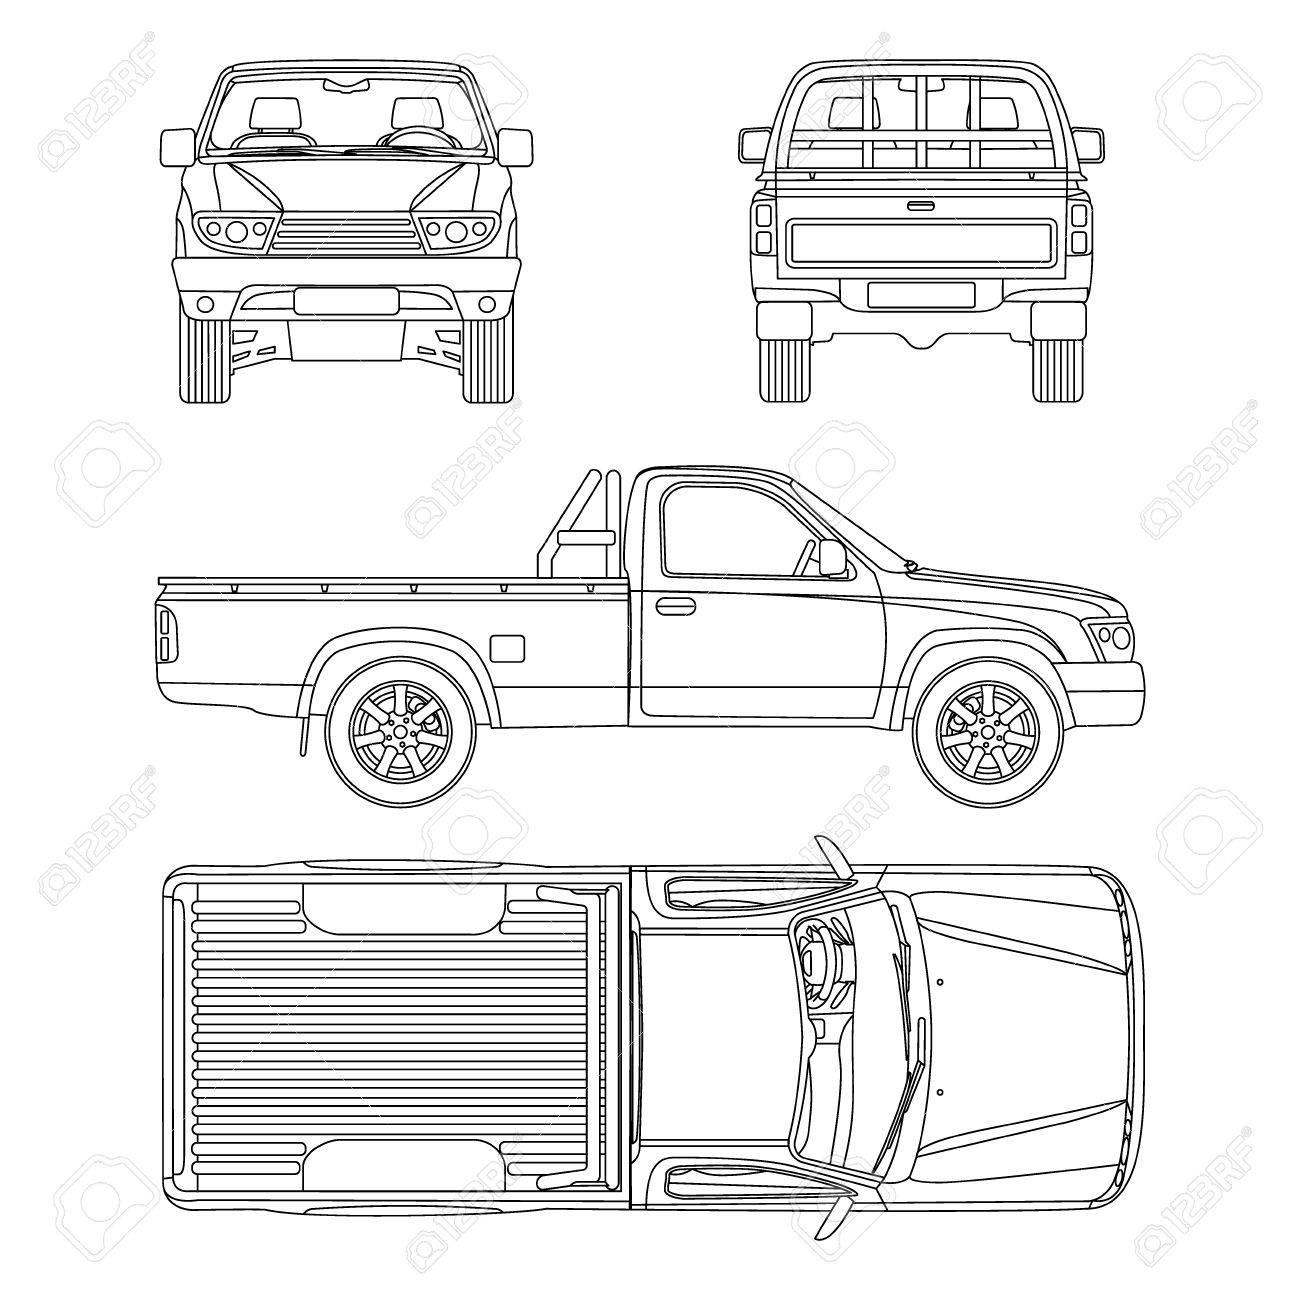 Blue print of car dolgular car blueprints dolgularcom street map making software malvernweather Choice Image